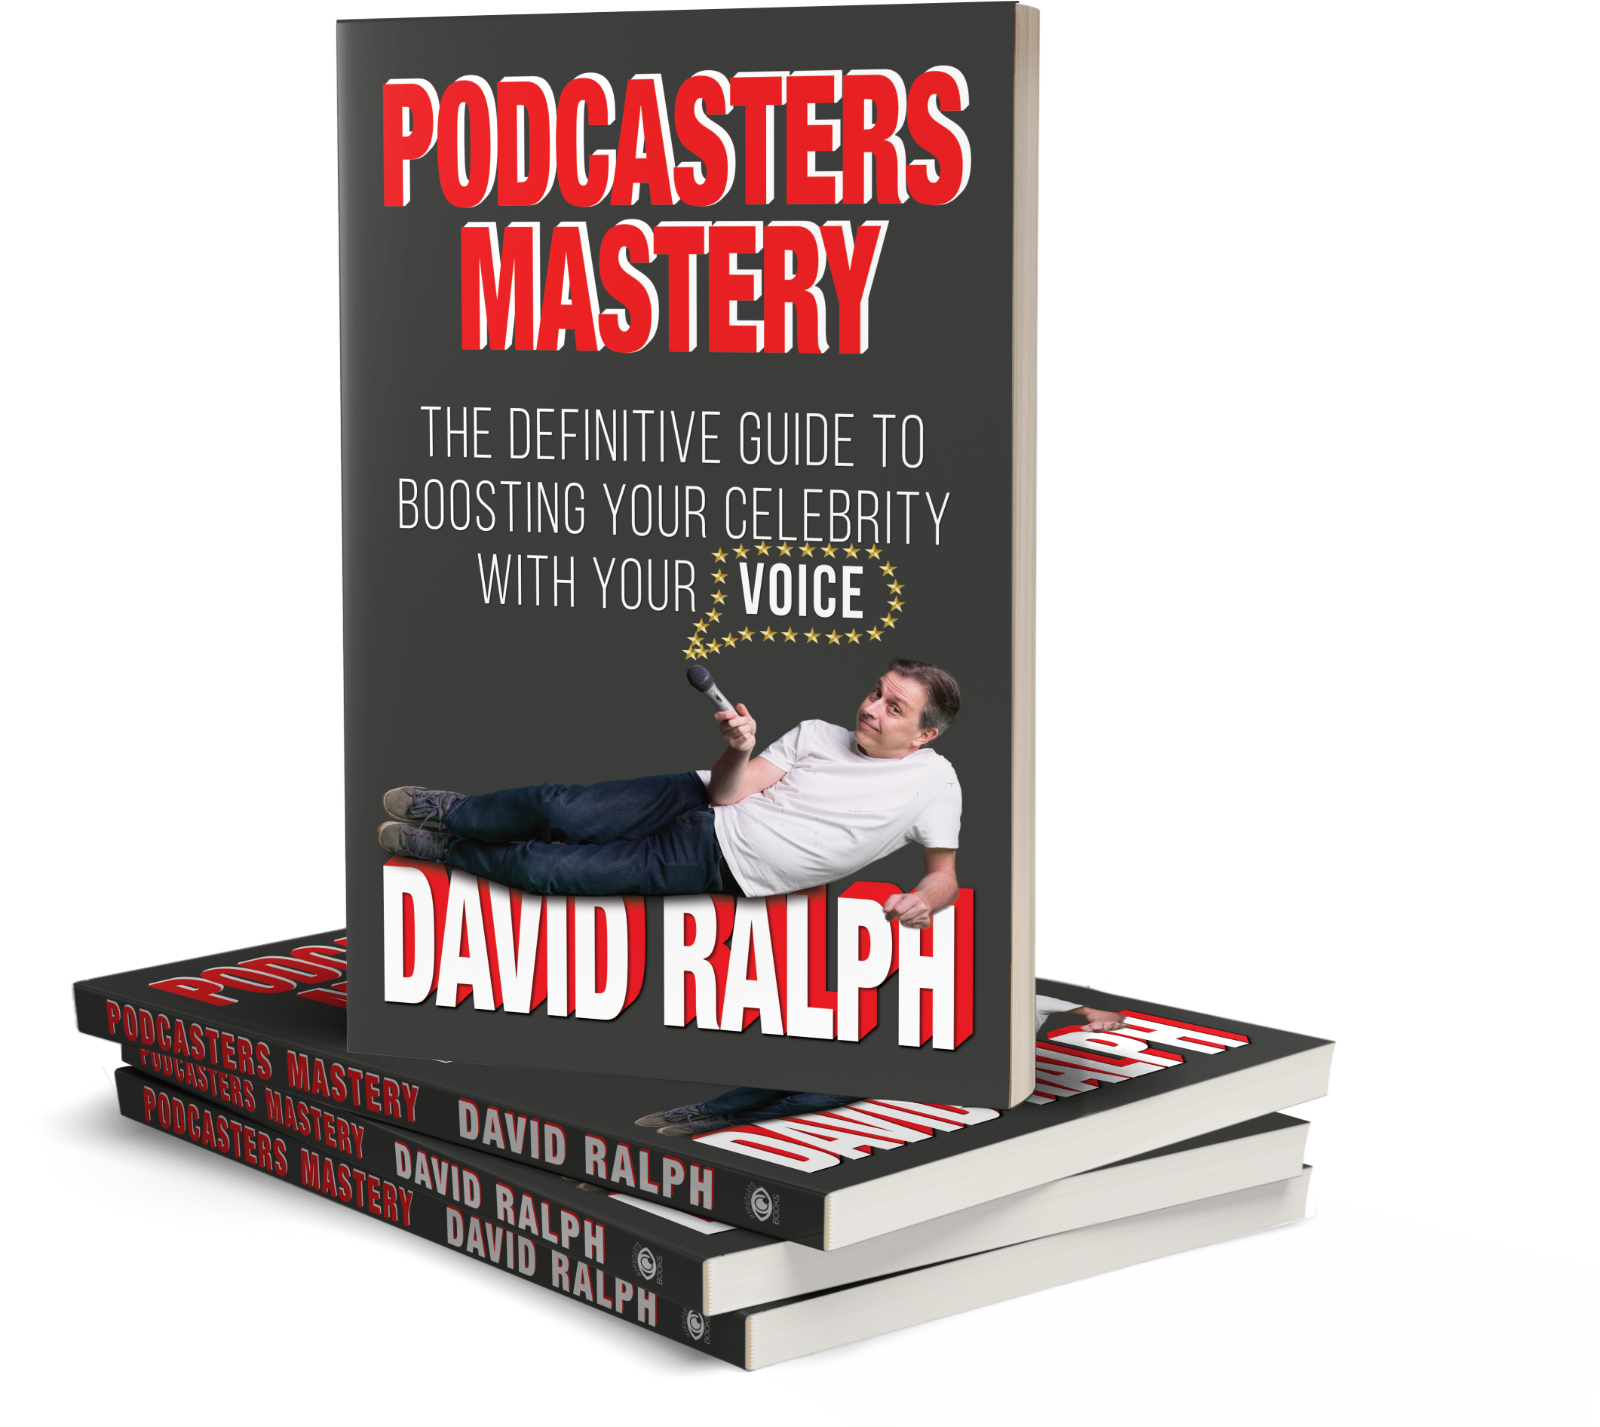 Podcasters Mastery David Ralph #hypnoartsbooks